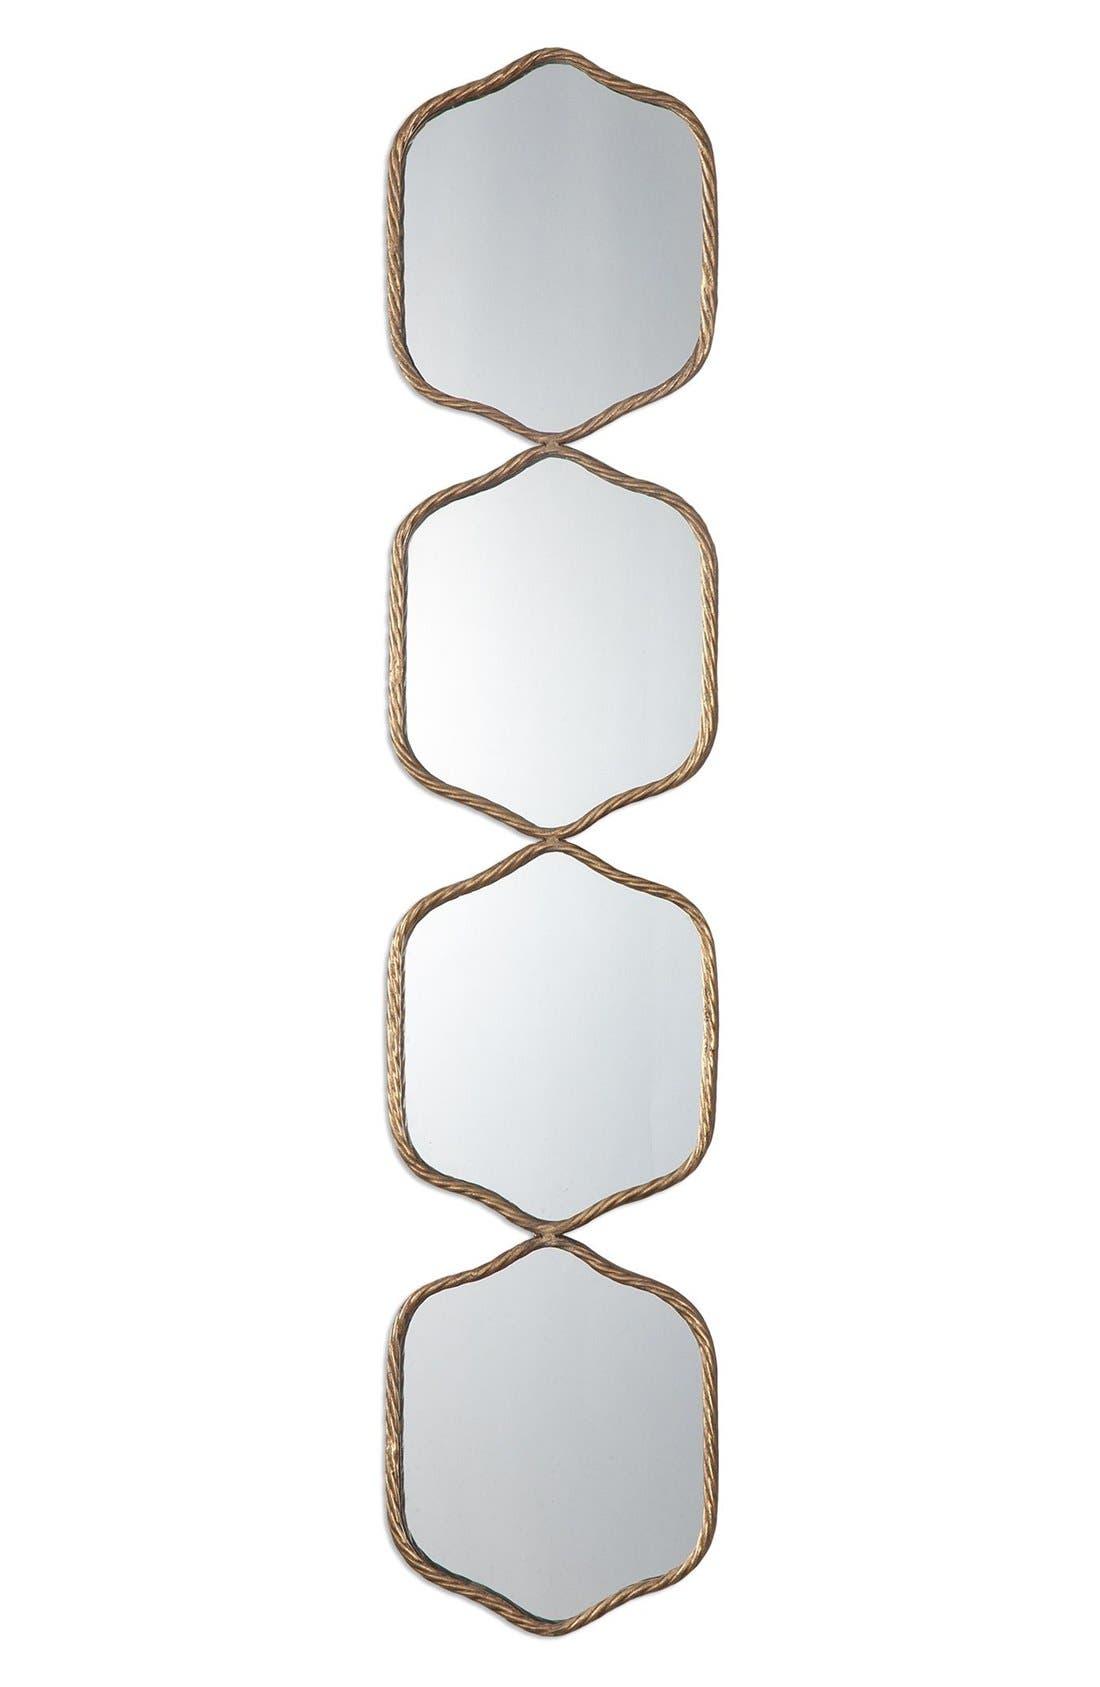 Main Image - Uttermost 'Myriam' Wall Mirror